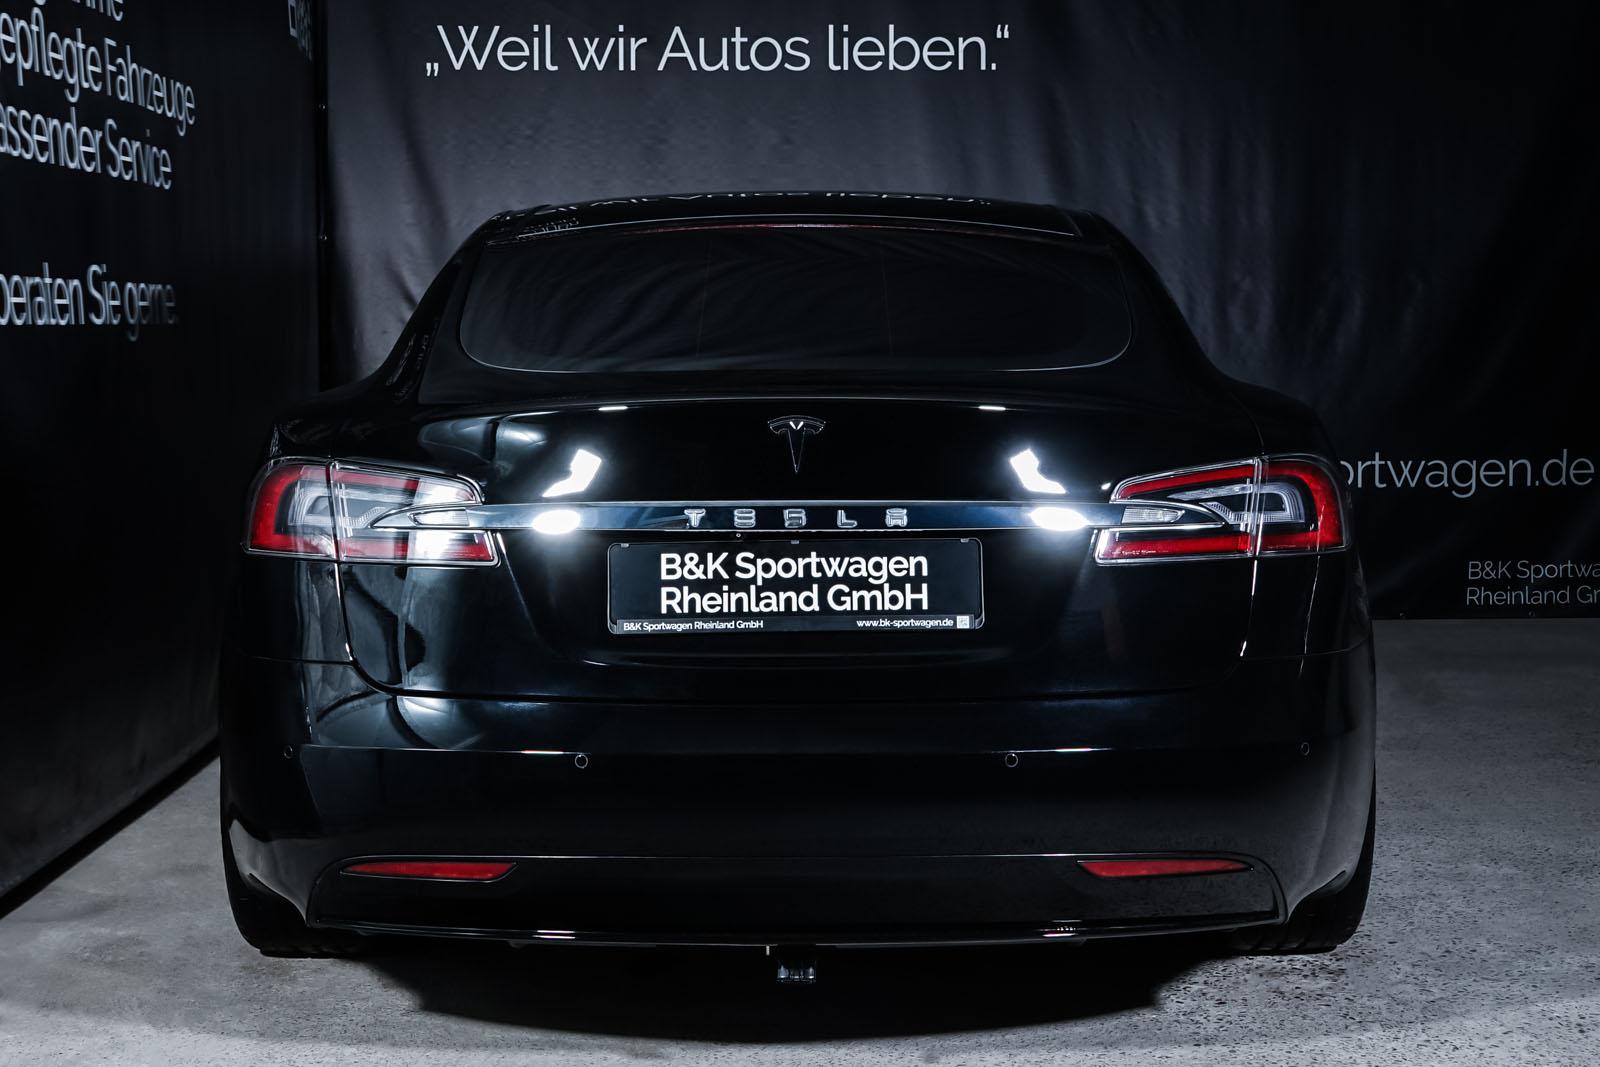 Tesla_ModelS_Schwarz_Schwarz_TES-6166_13_w